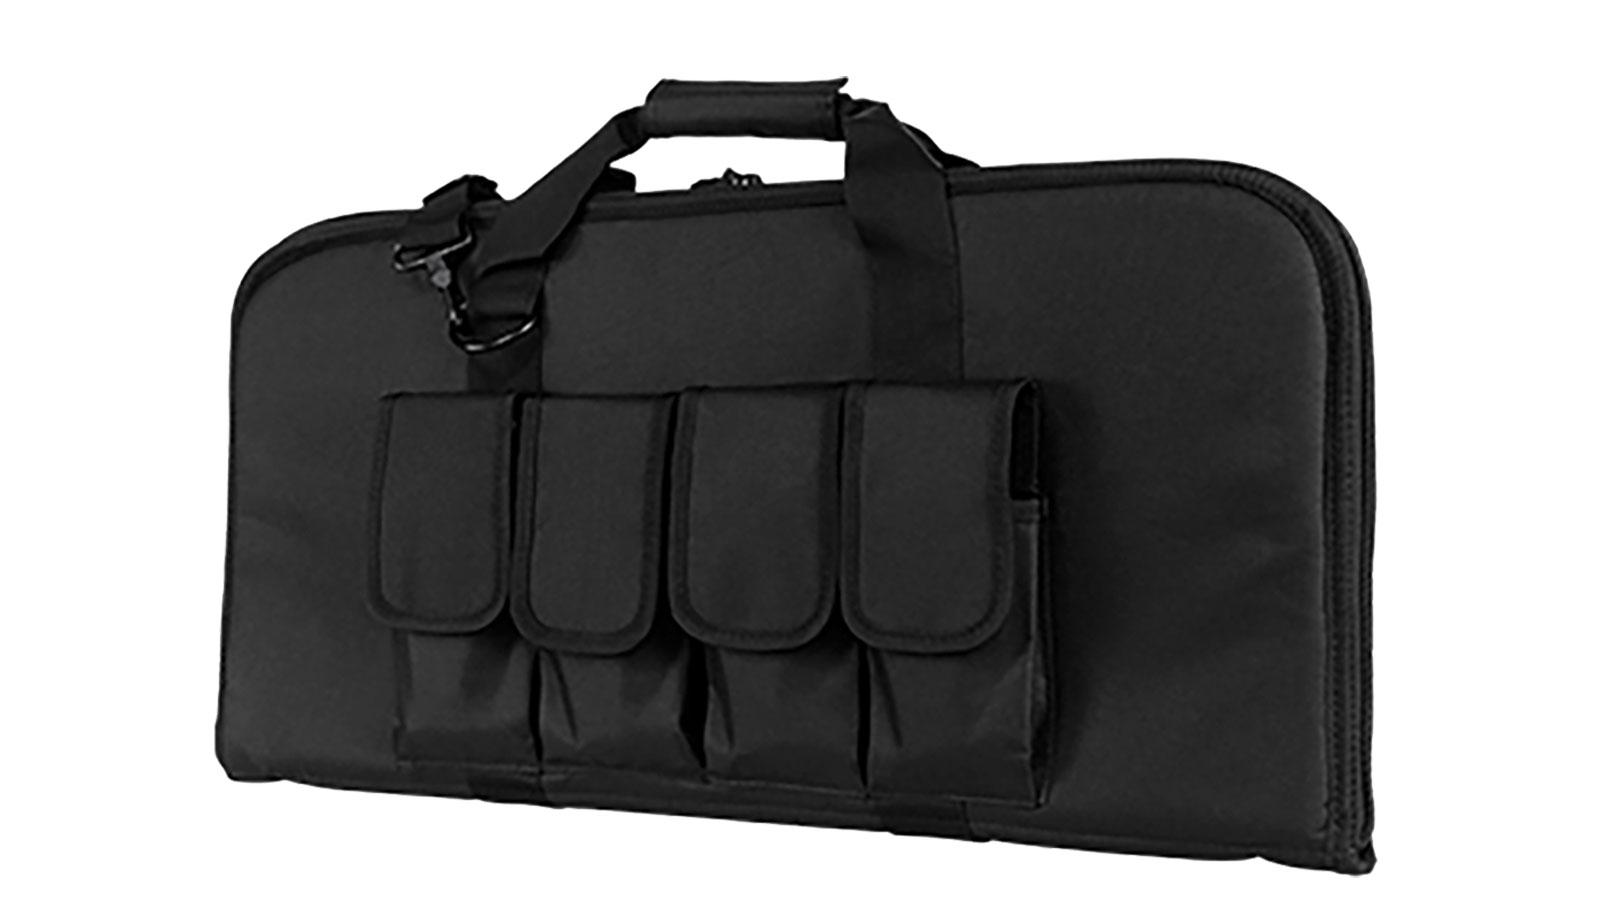 Vism AR15 and AK Carbine Pistol Case 2910 Style-Black